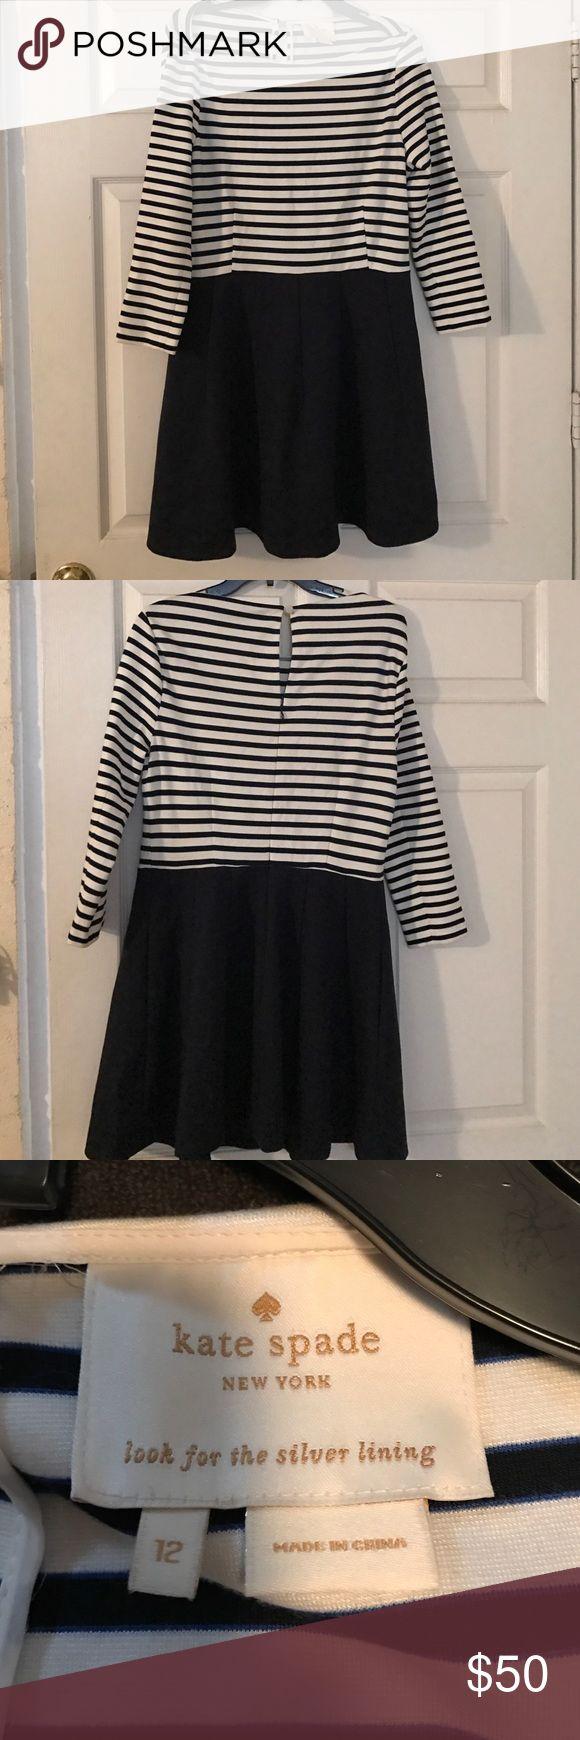 Kate Spade nautical mini dress Adorable Kate Spade blue and white mini sailor dress. kate spade Dresses Mini